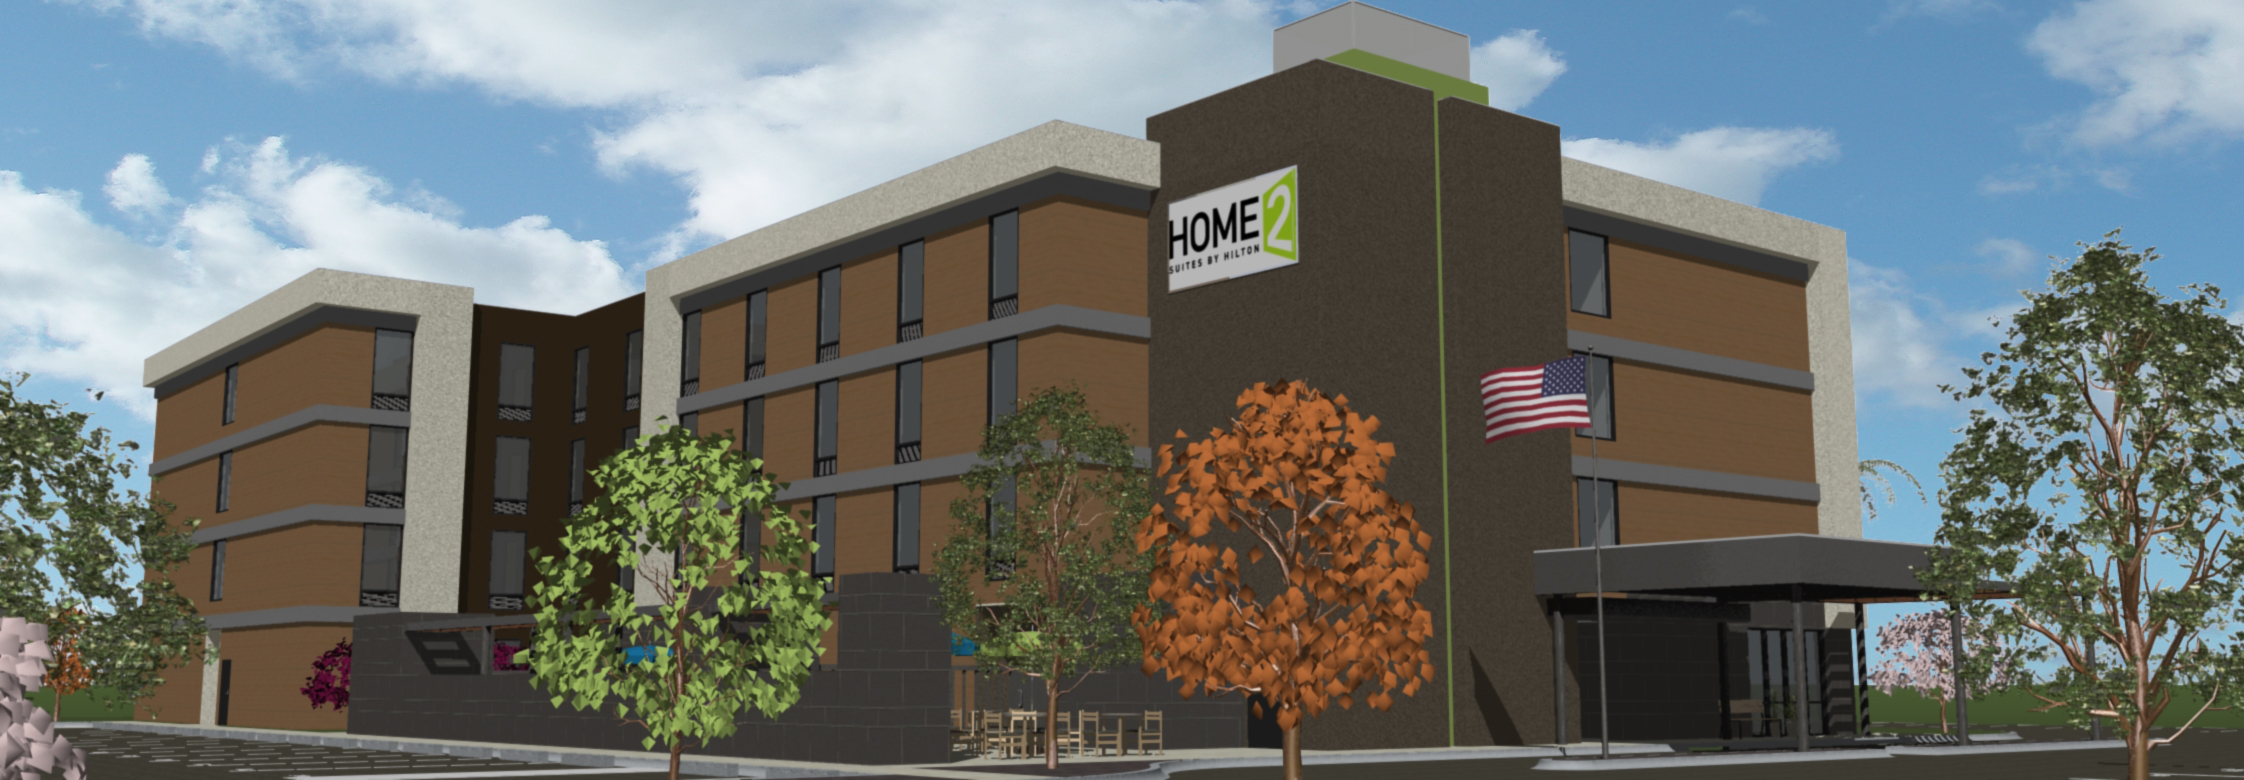 Home2, Warner Robins, GA